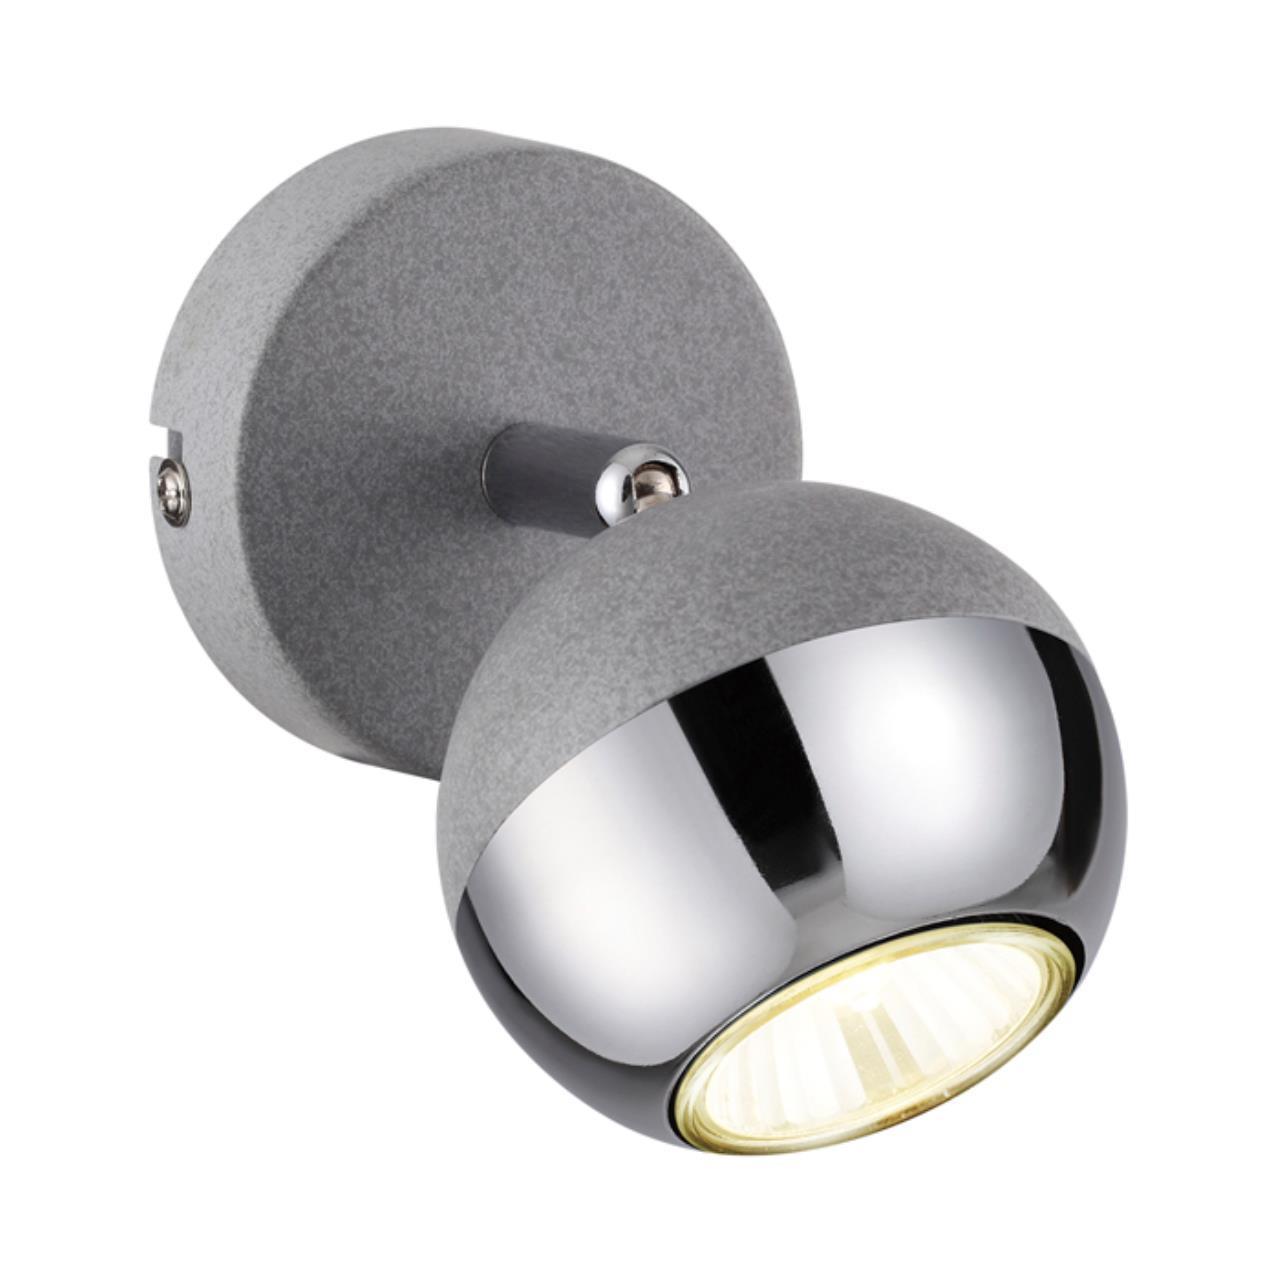 3801/1W MODERN ODL19 249 графитовый серый/металл Настенный светильник GU10 1*50W 80*80*135 CEMETA